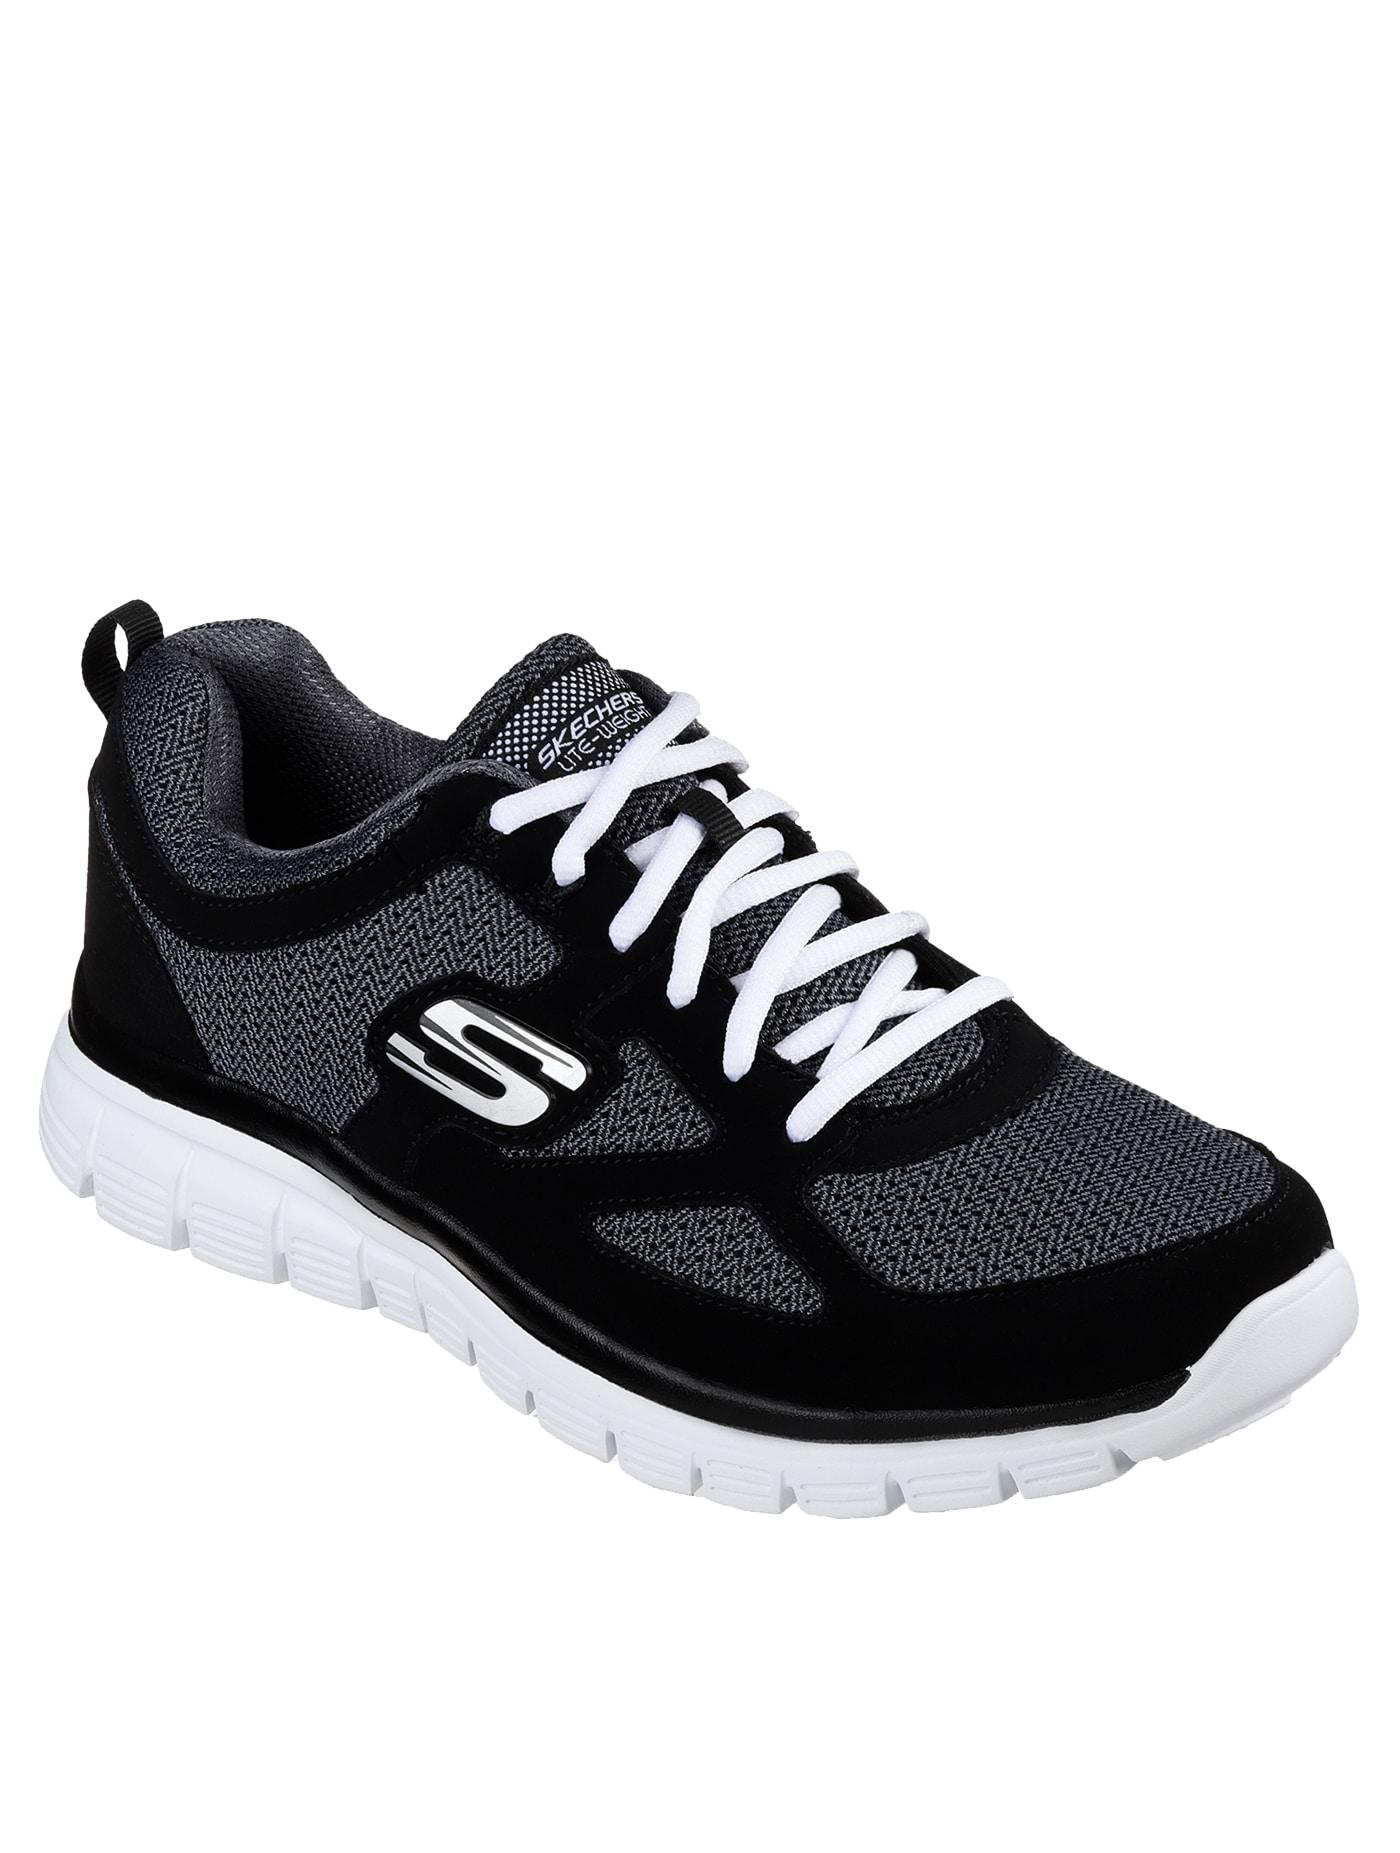 Intacto siga adelante polvo  SKECHERS รองเท้าลำลองผู้ชาย รุ่น Burns - Agoura MS 526   Central Online